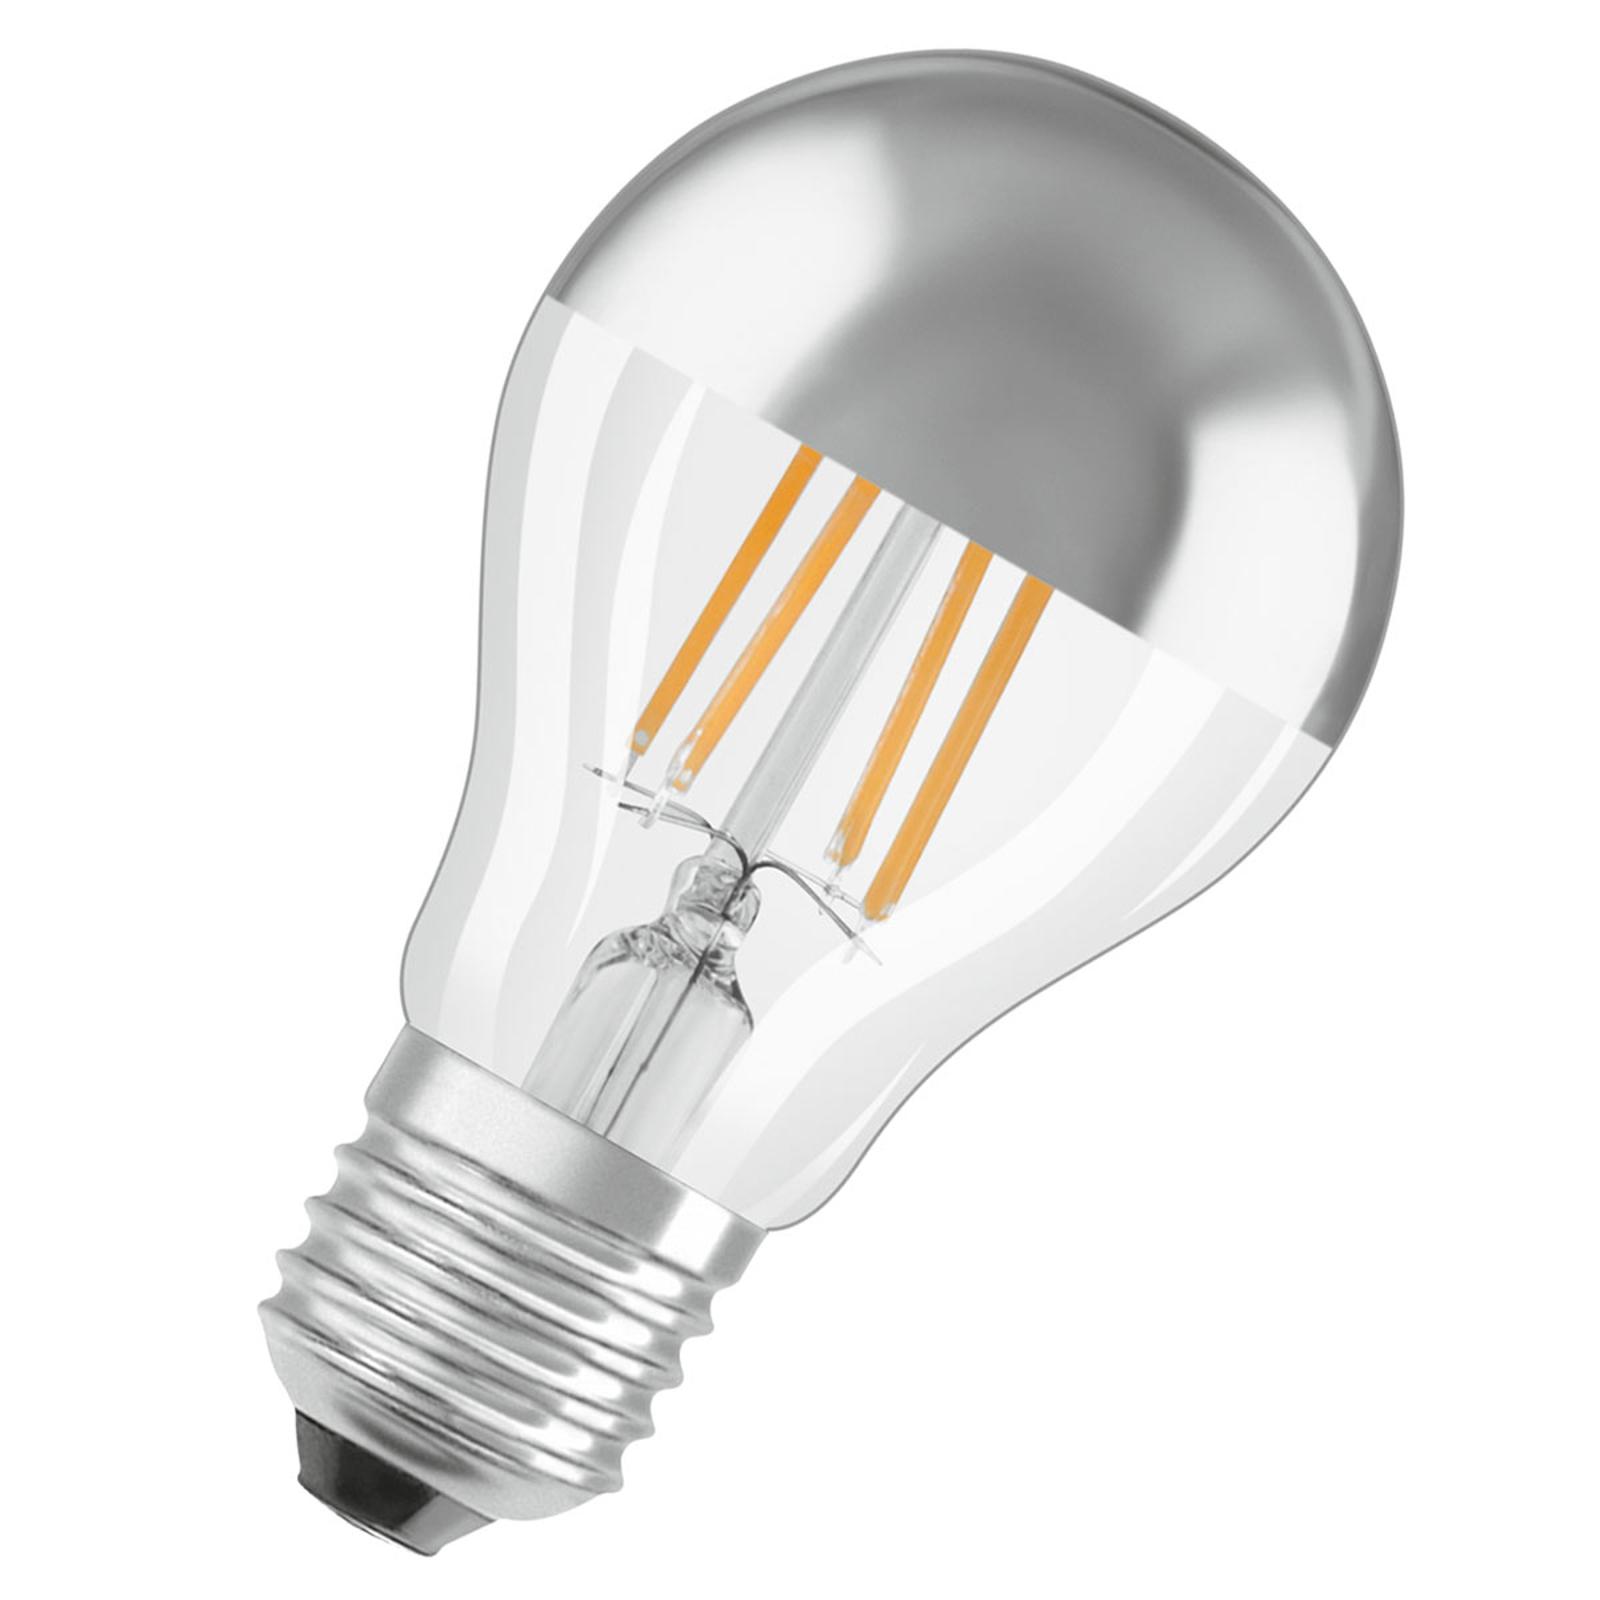 OSRAM LED-Lampe E27 Mirror silver 4W 2.700K Karton